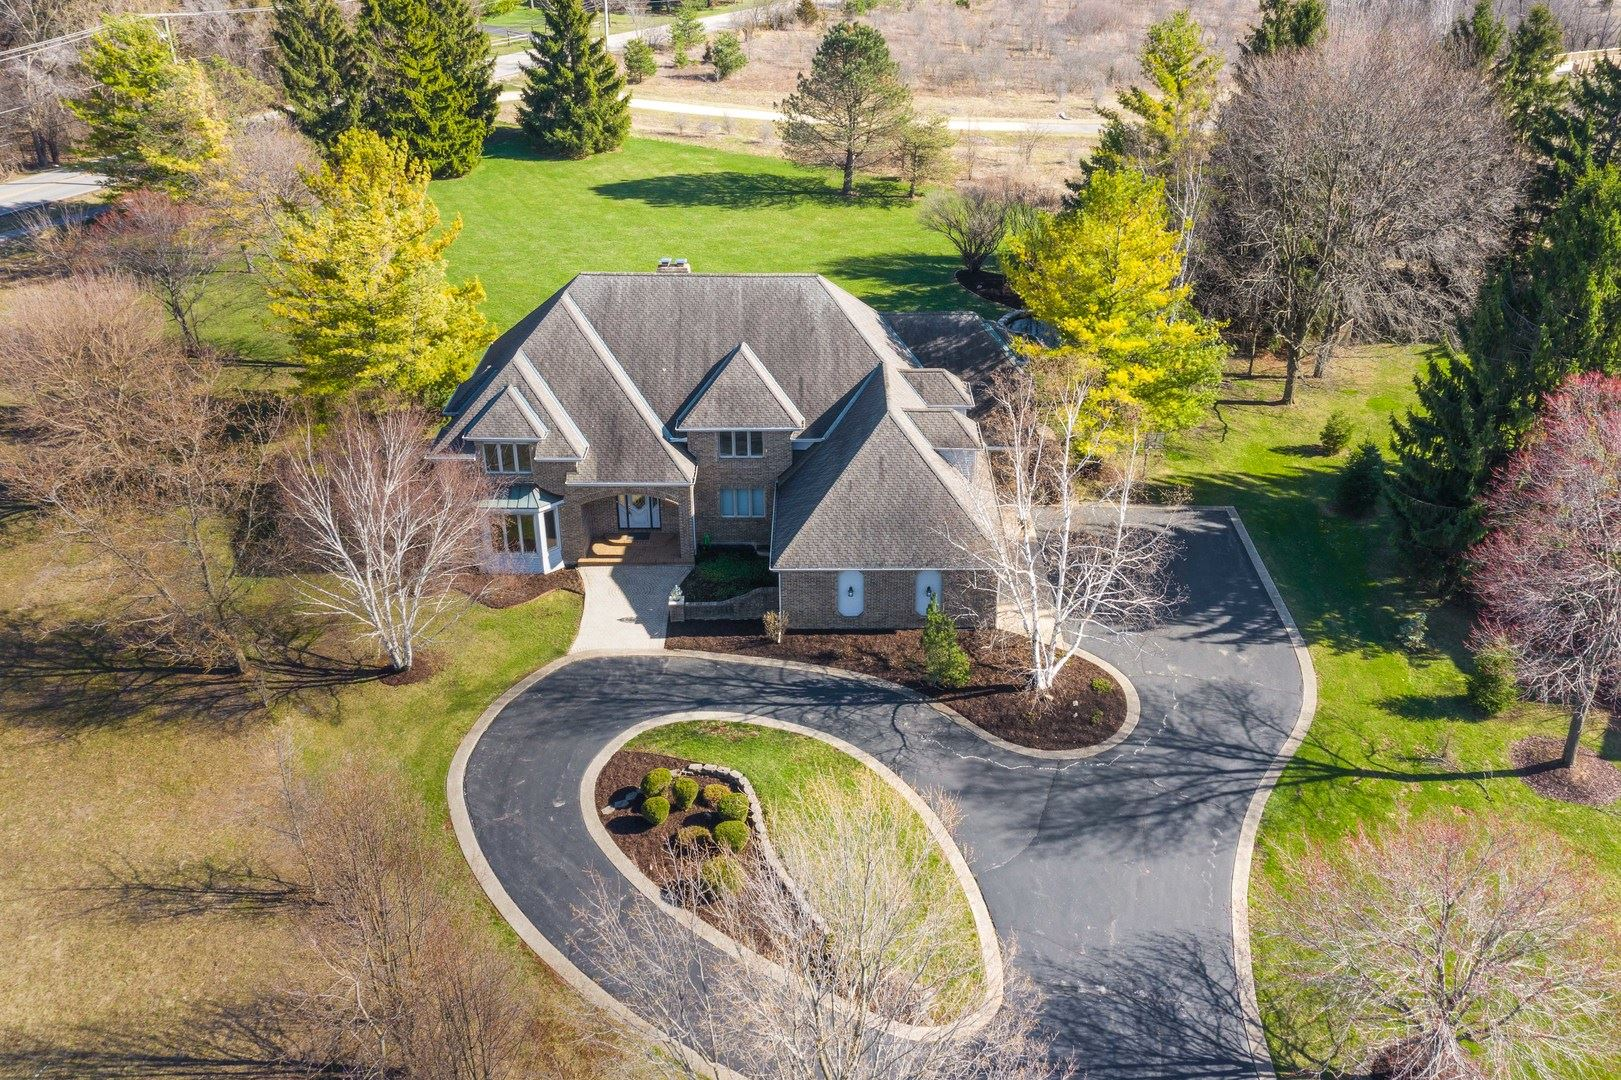 1701 Edgewood Lane, Long Grove, IL 60047 - #: 11053463